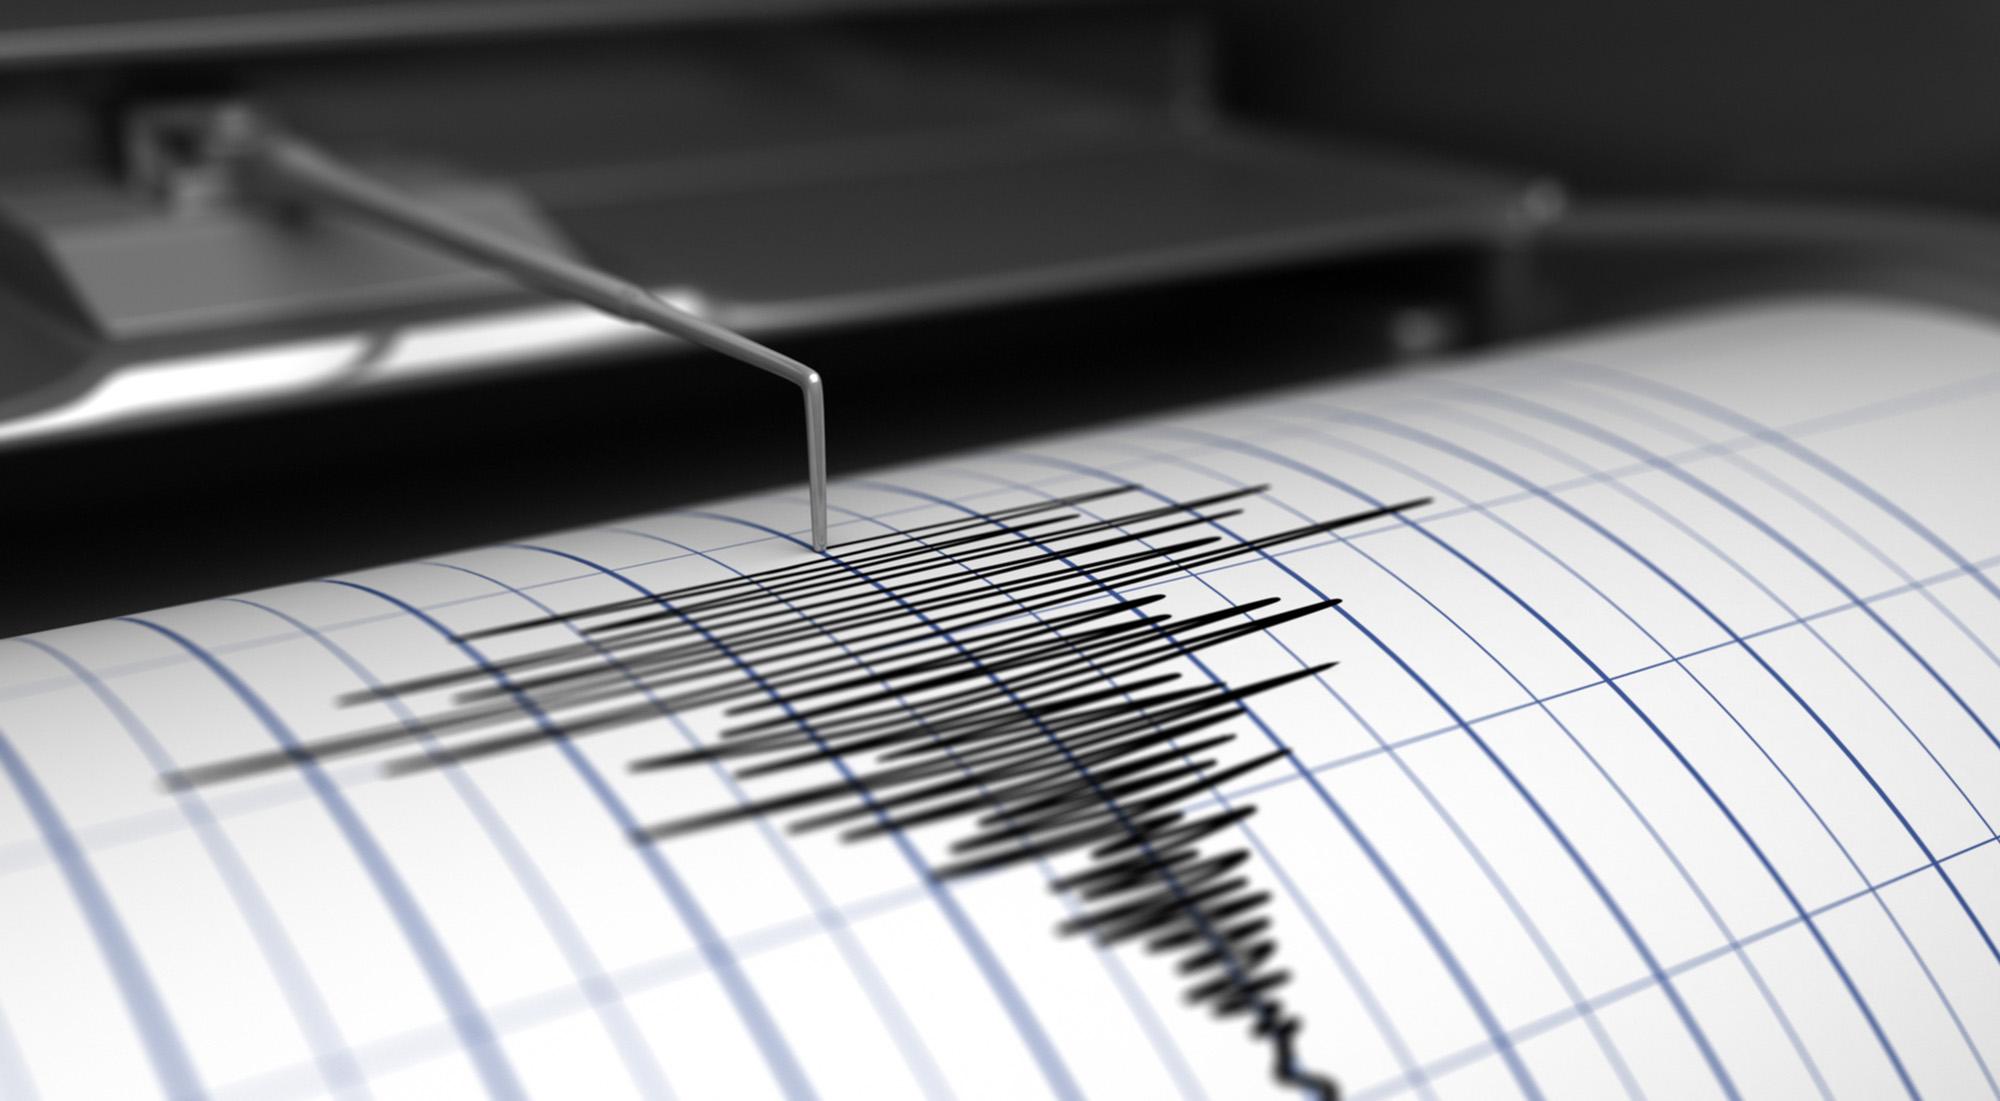 Worksheet Natural Hazards Earthquakes And Tsunamis